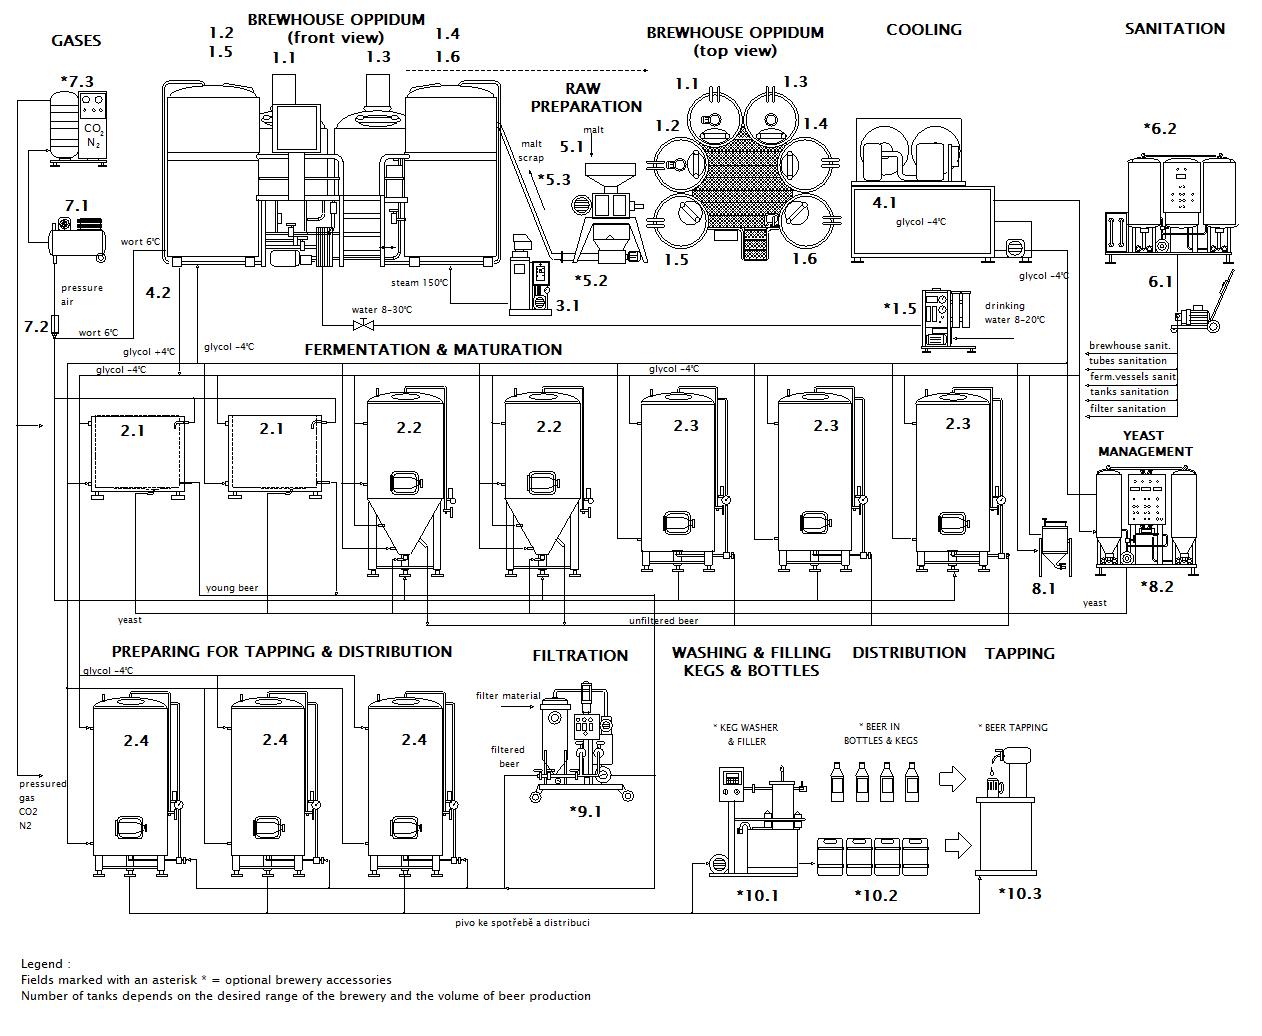 Scheme of the Micro brewery Breworx Oppidum OCF